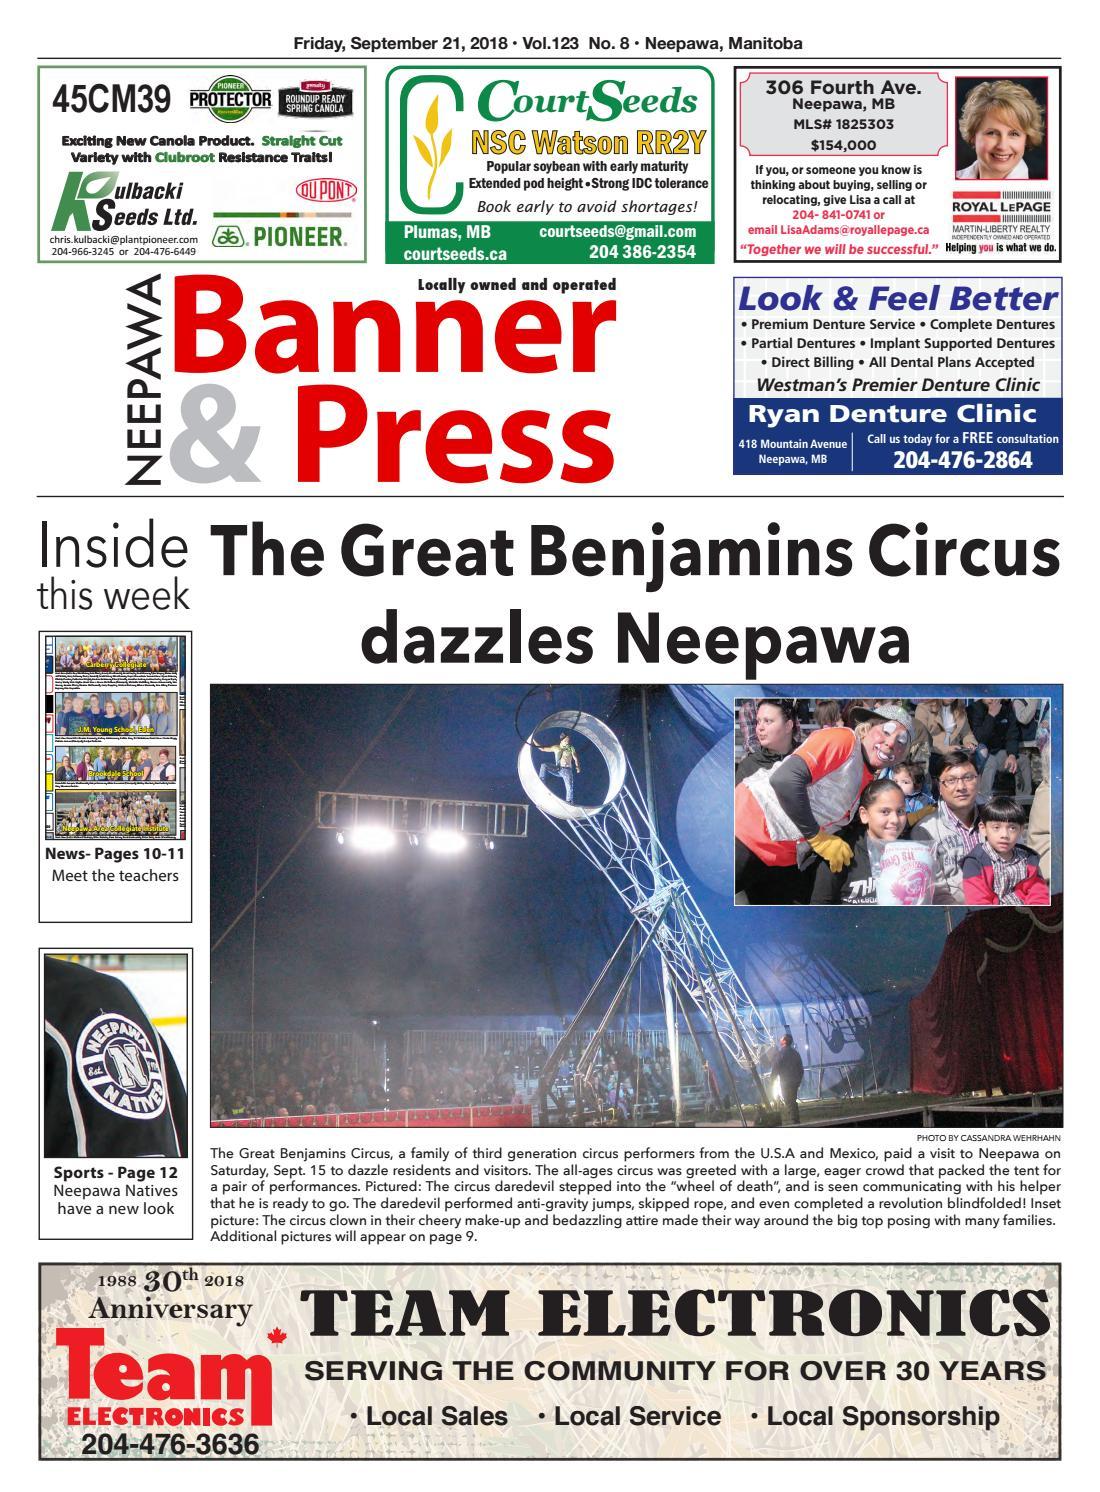 Neepawa Banner & Press - Sept. 21 edition by Neepawa Banner&Press - issuu